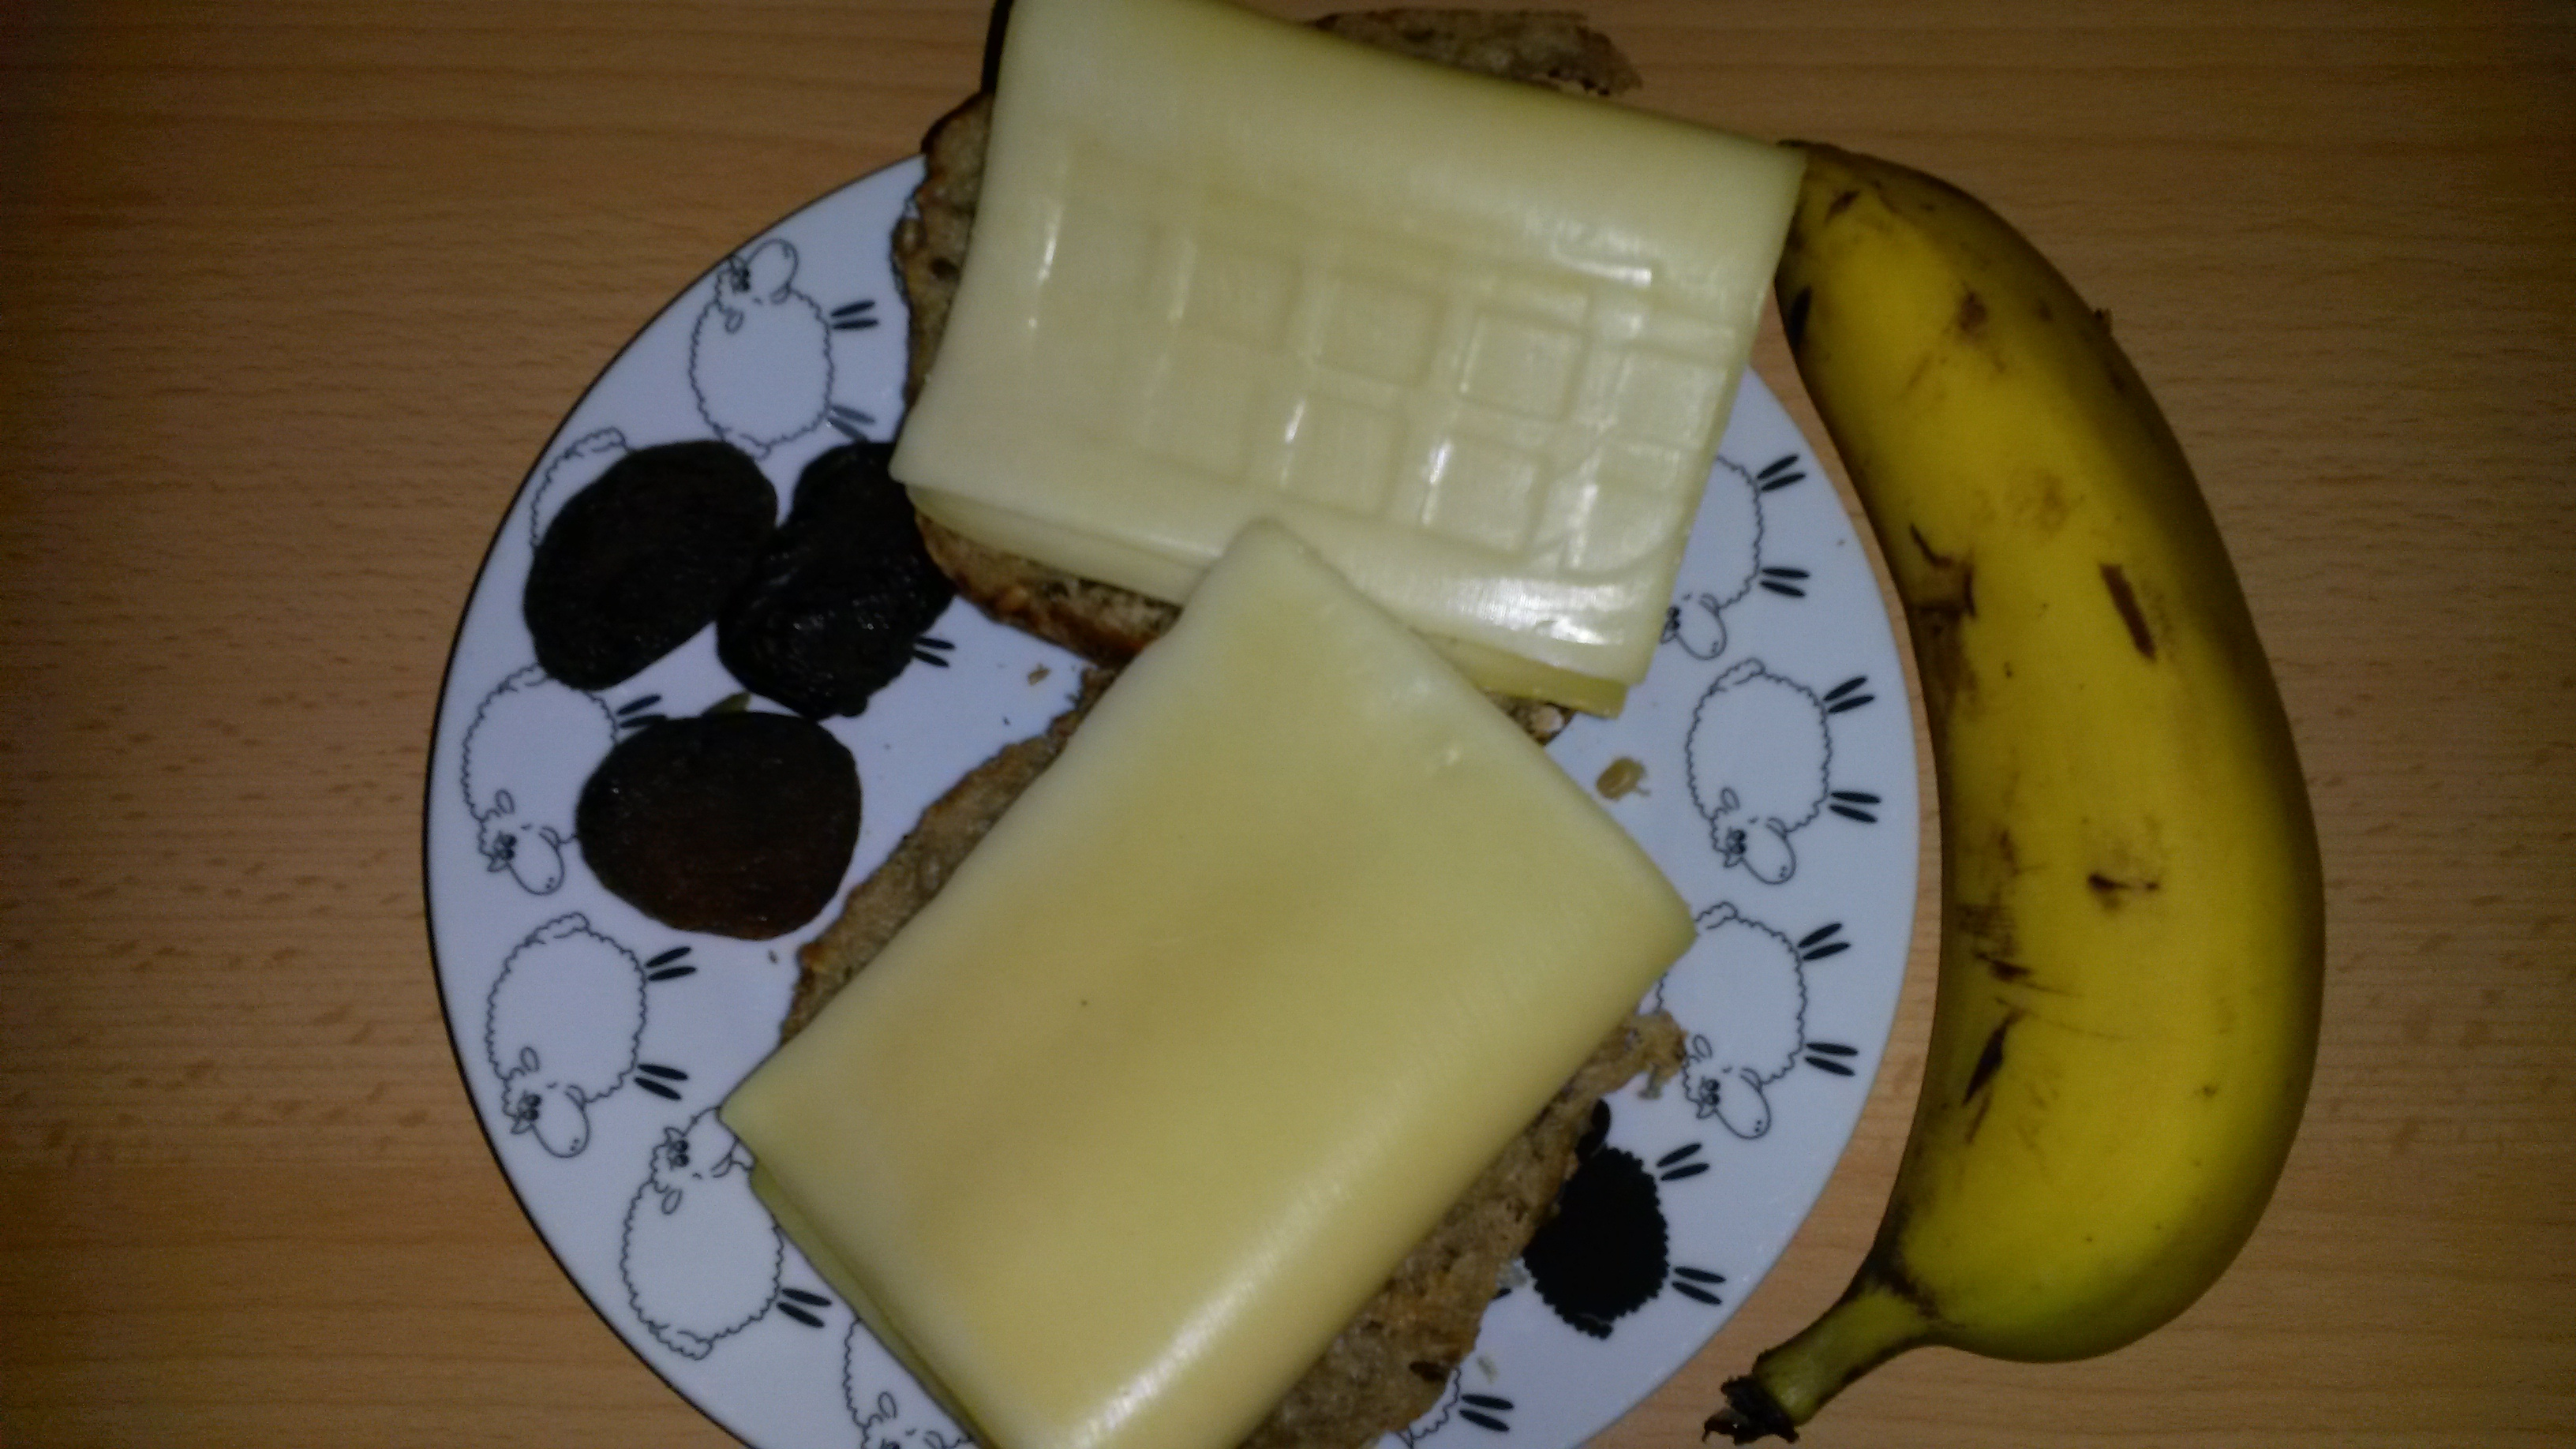 http://foodloader.net/sk0r_2014-04-19_Kaesebroetchen_Banane_Trockenobst.jpg